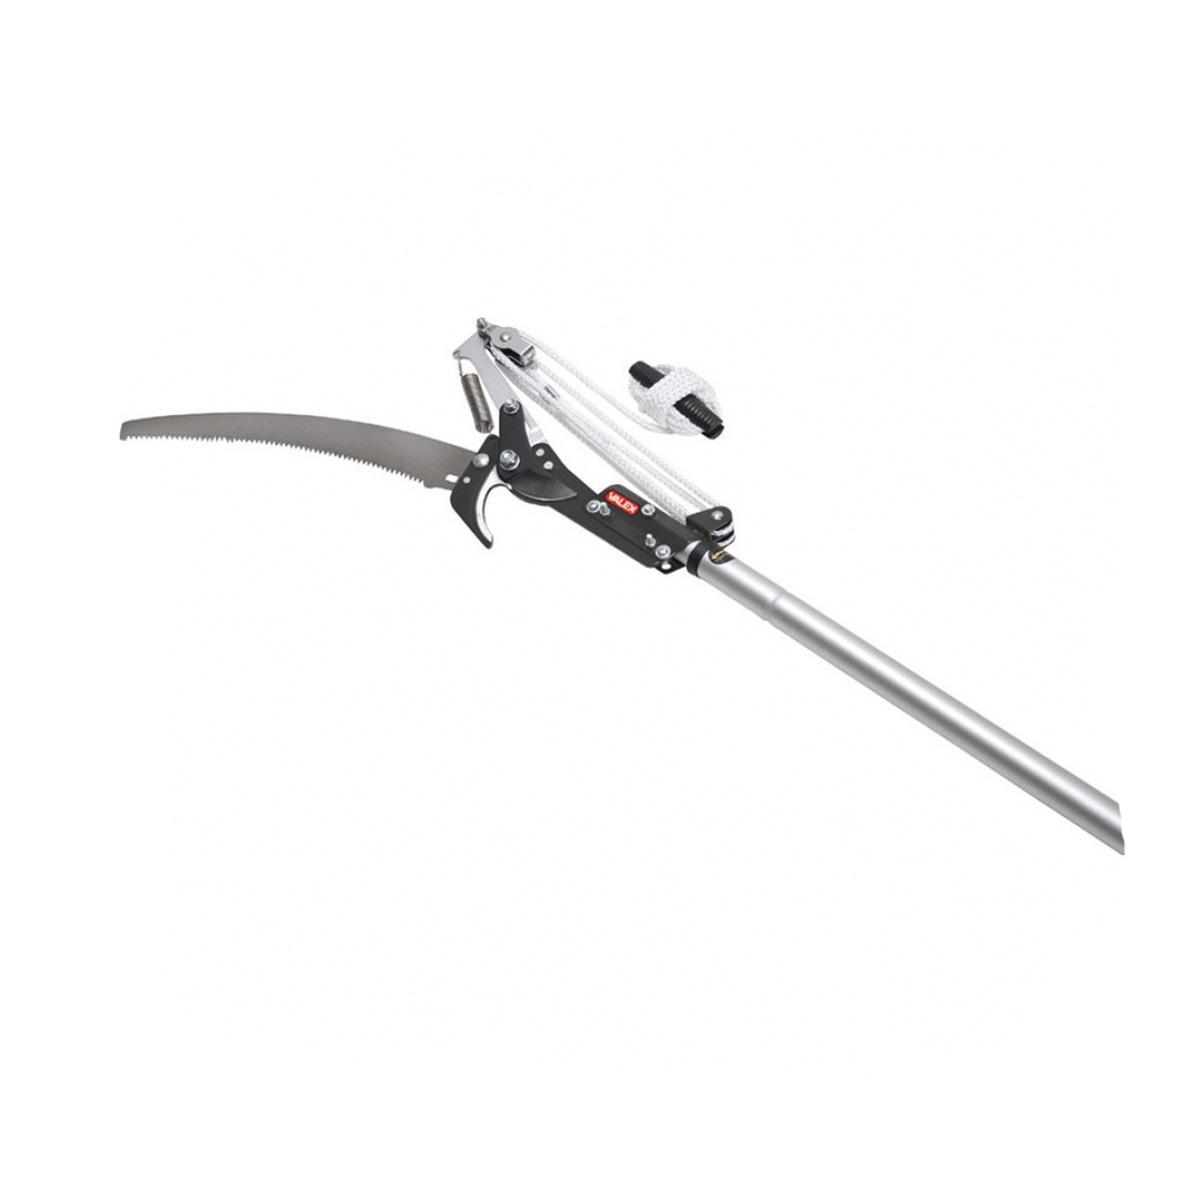 Valex 1486253 Survey screw with saw and telescopic handle